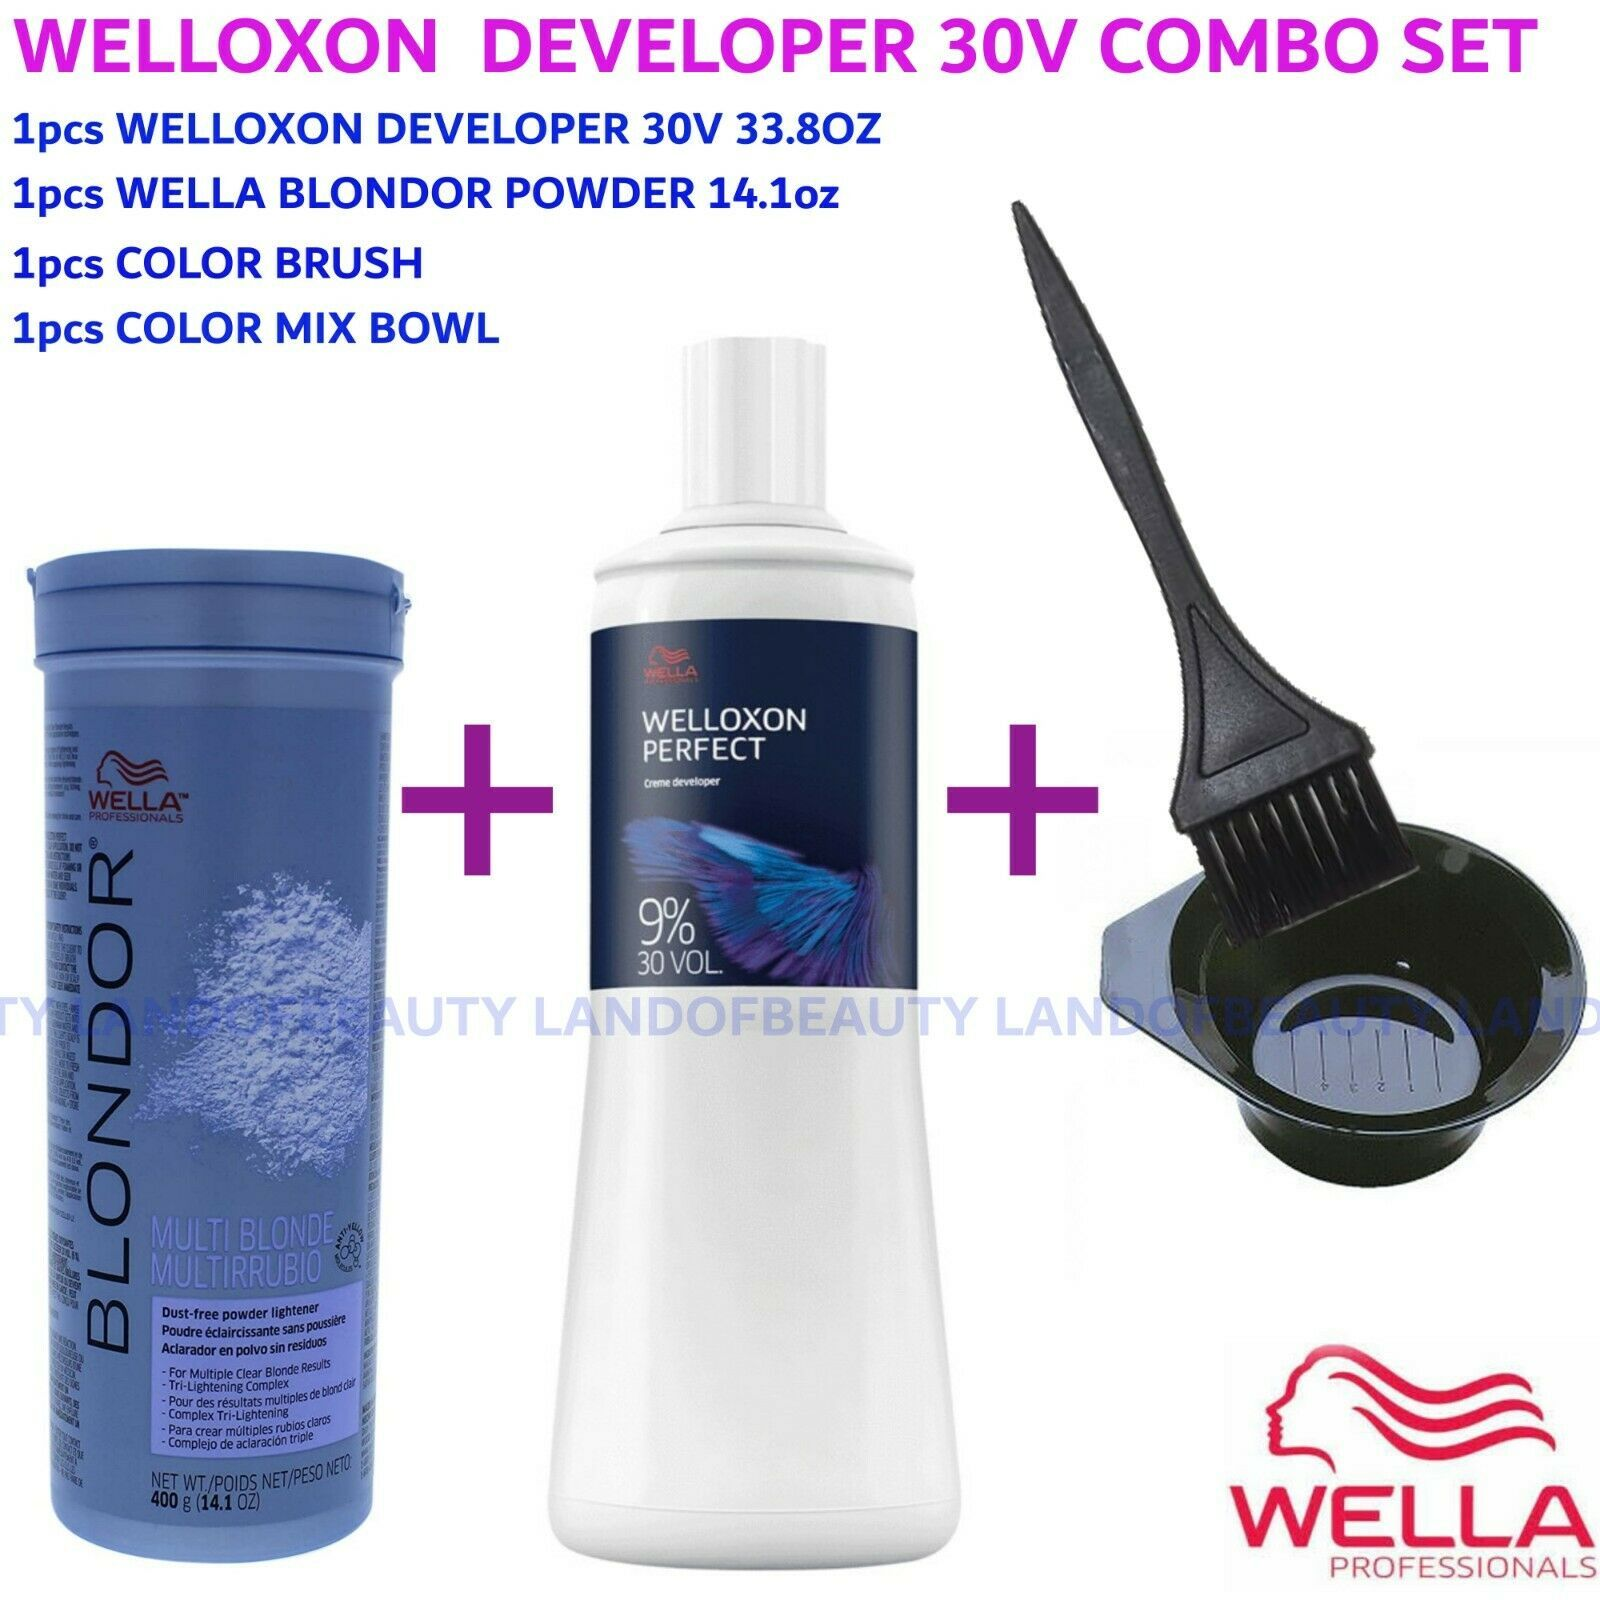 WELLA BLONDOR MULTI BLONDE POWDER 14.1oz+30V DEVELPER 33.8OZ+COLOR BRUSH+BOWL - $42.99